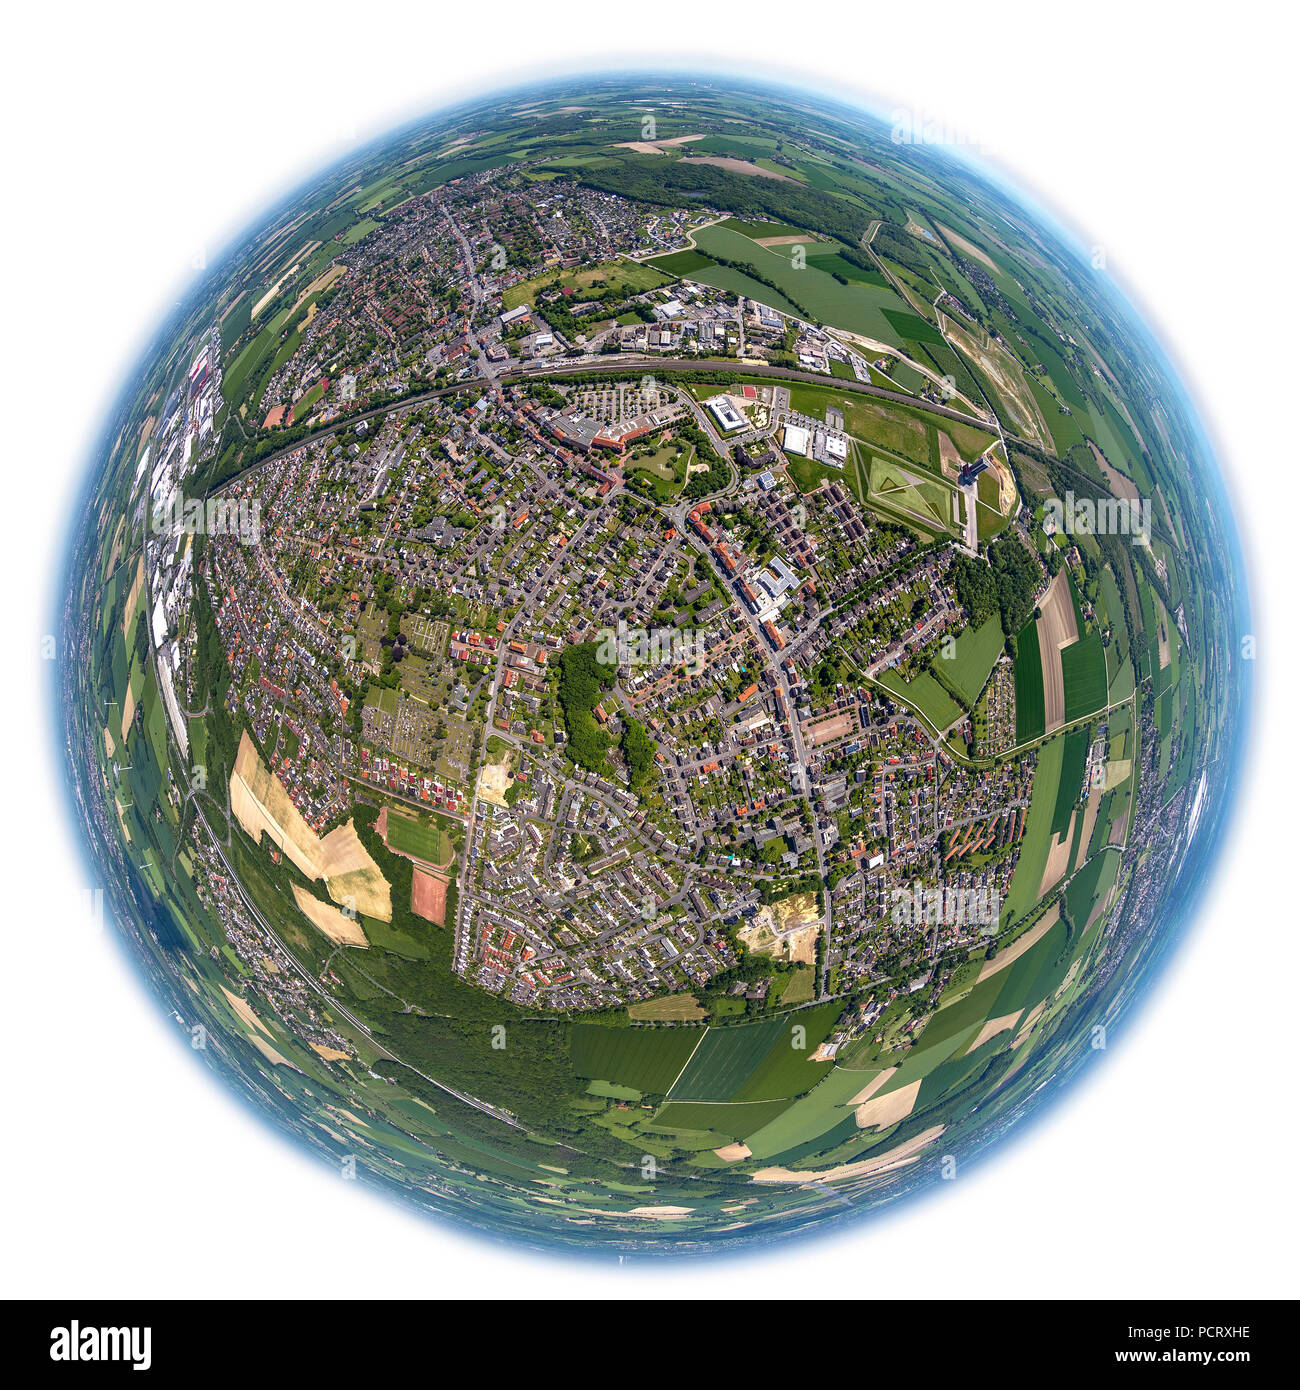 Fisheye lens, overview of Bönen, Bönen, Ruhr area, North Rhine-Westphalia, Germany - Stock Image